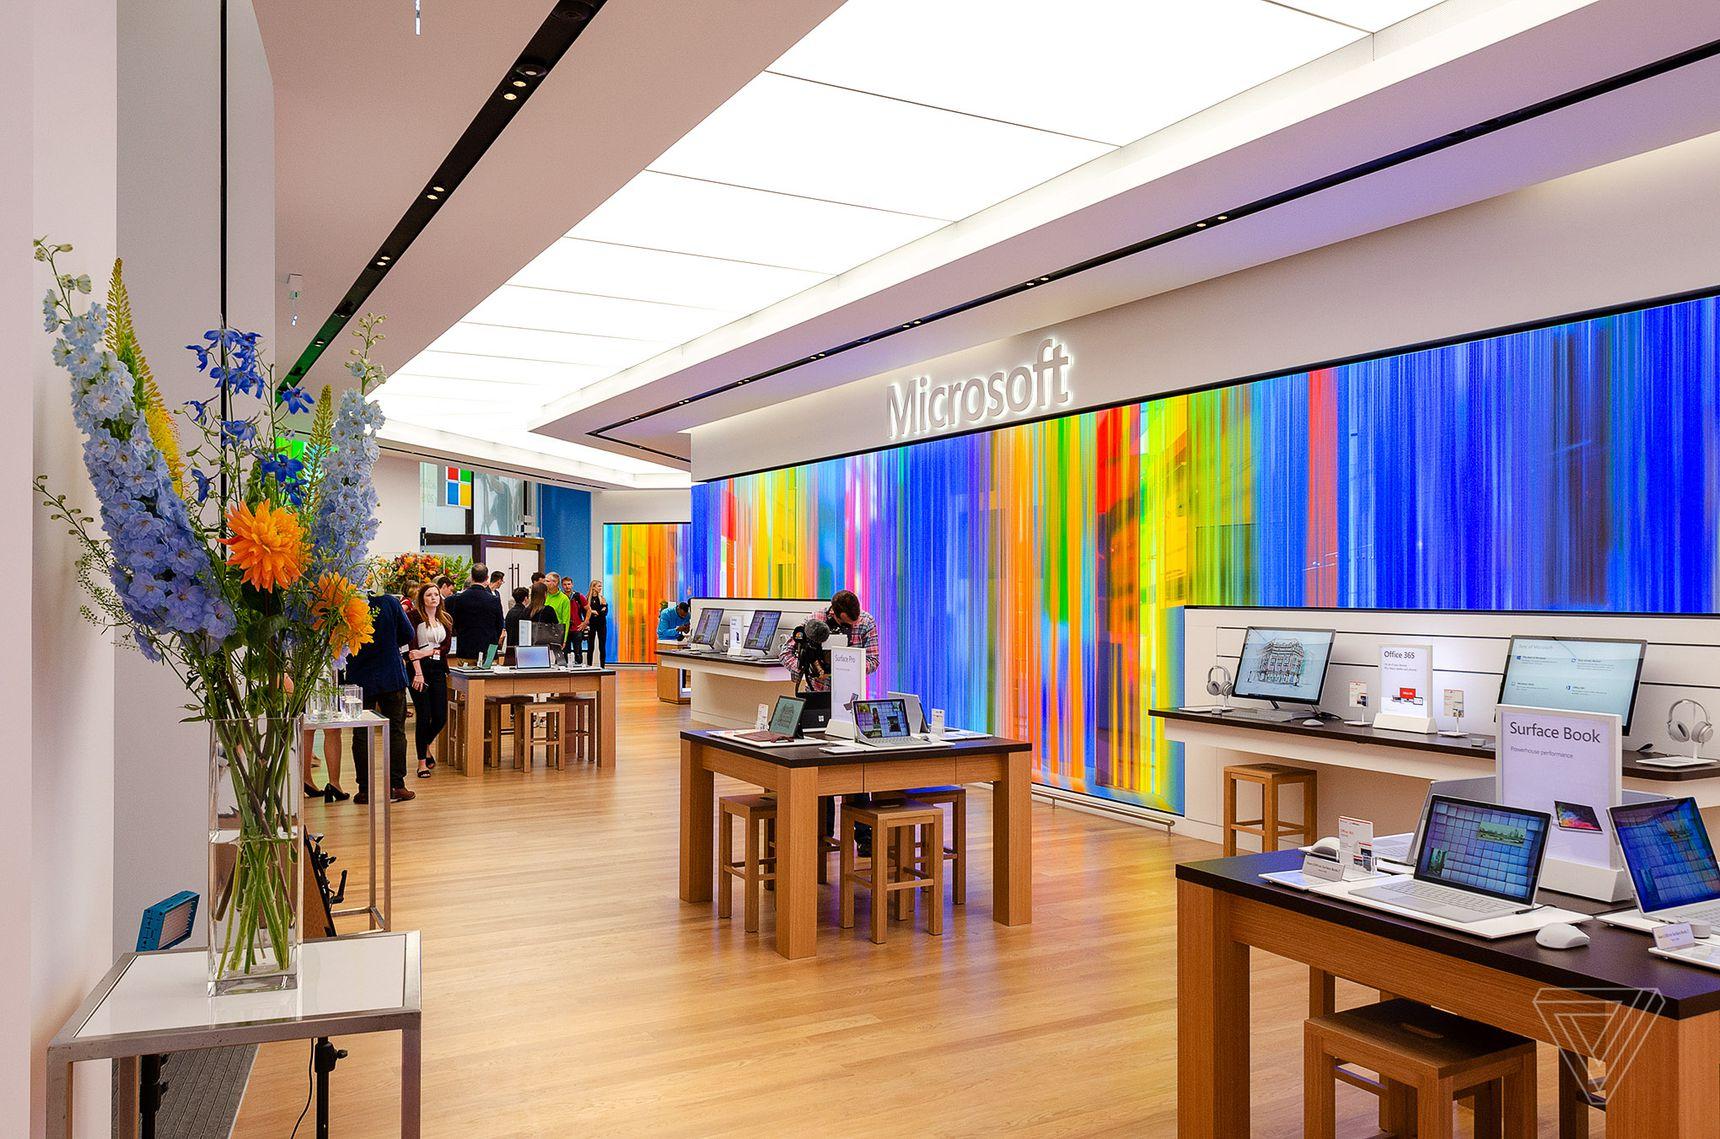 Microsoft's store in London